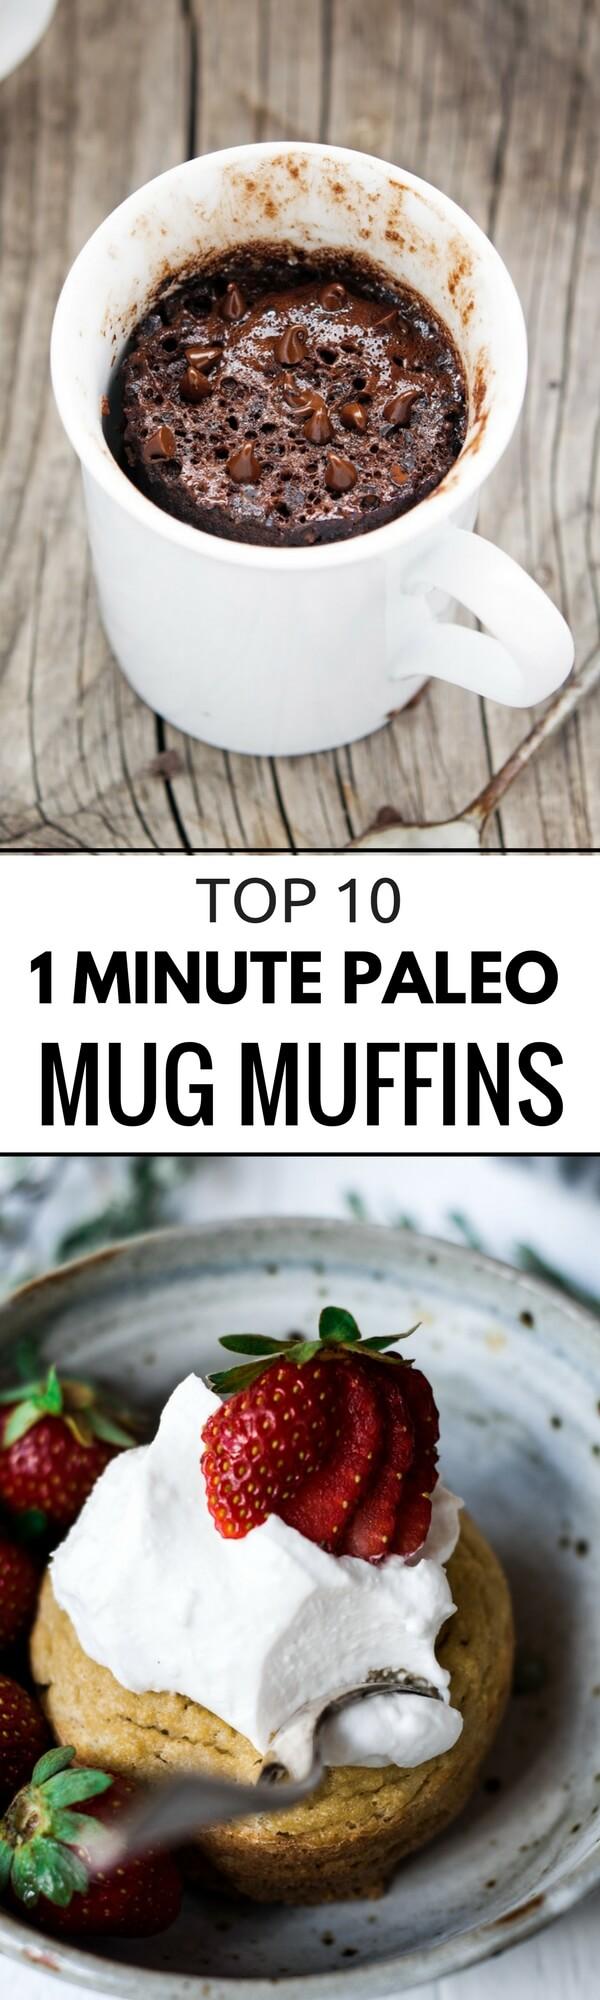 TOP 10 PALEO MUG MUFFINS - Paleo Gluten Free Eats